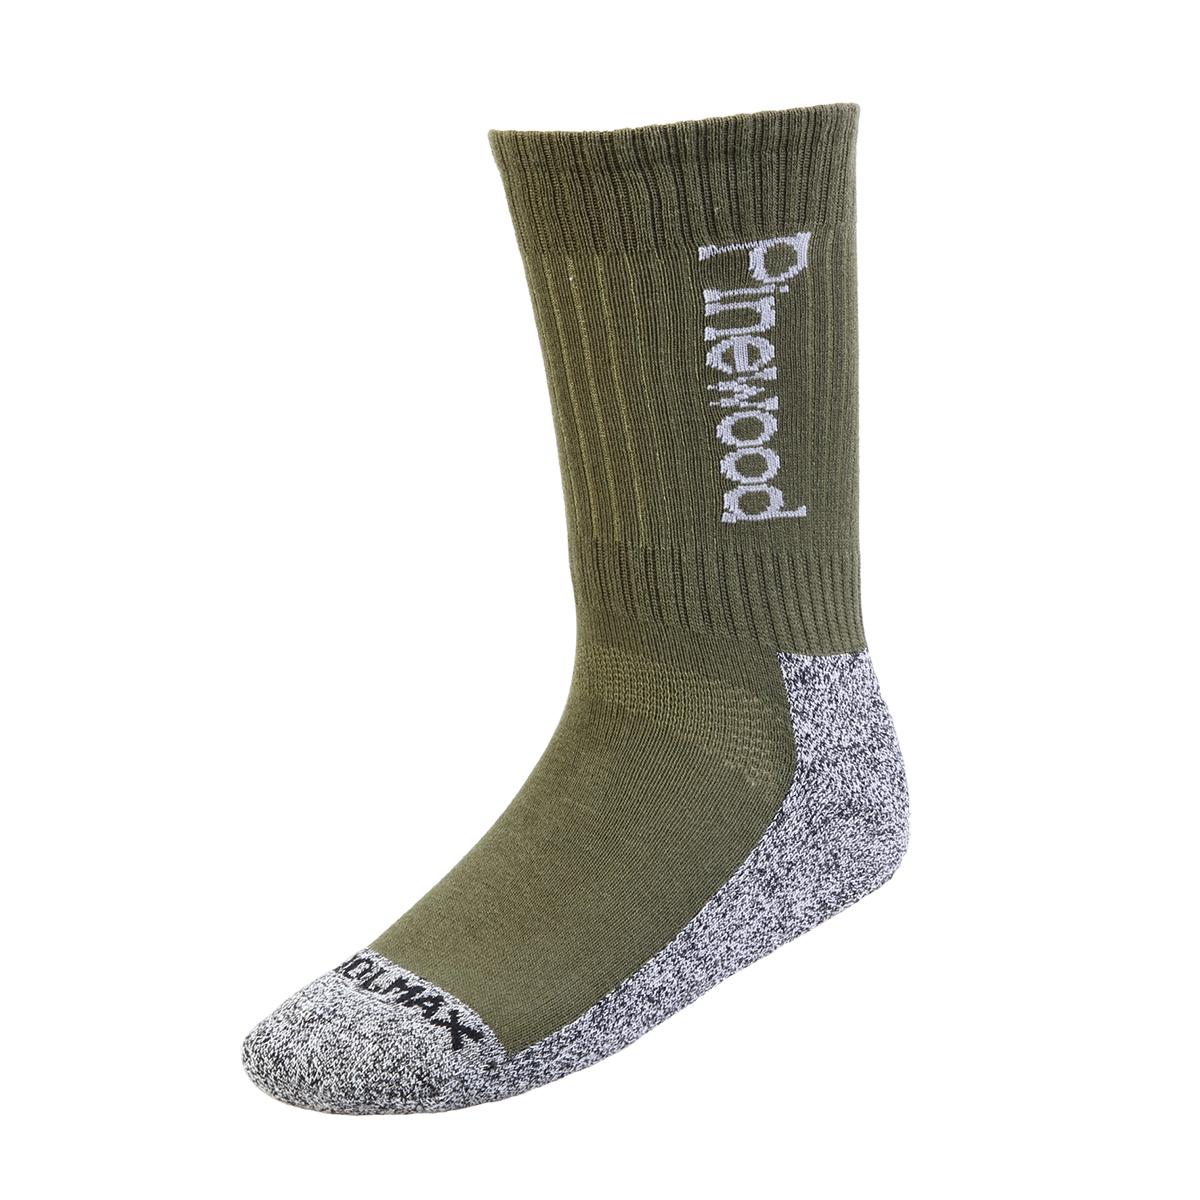 Pinewood Socke Coolmax kurz 2er-Set im Pareyshop